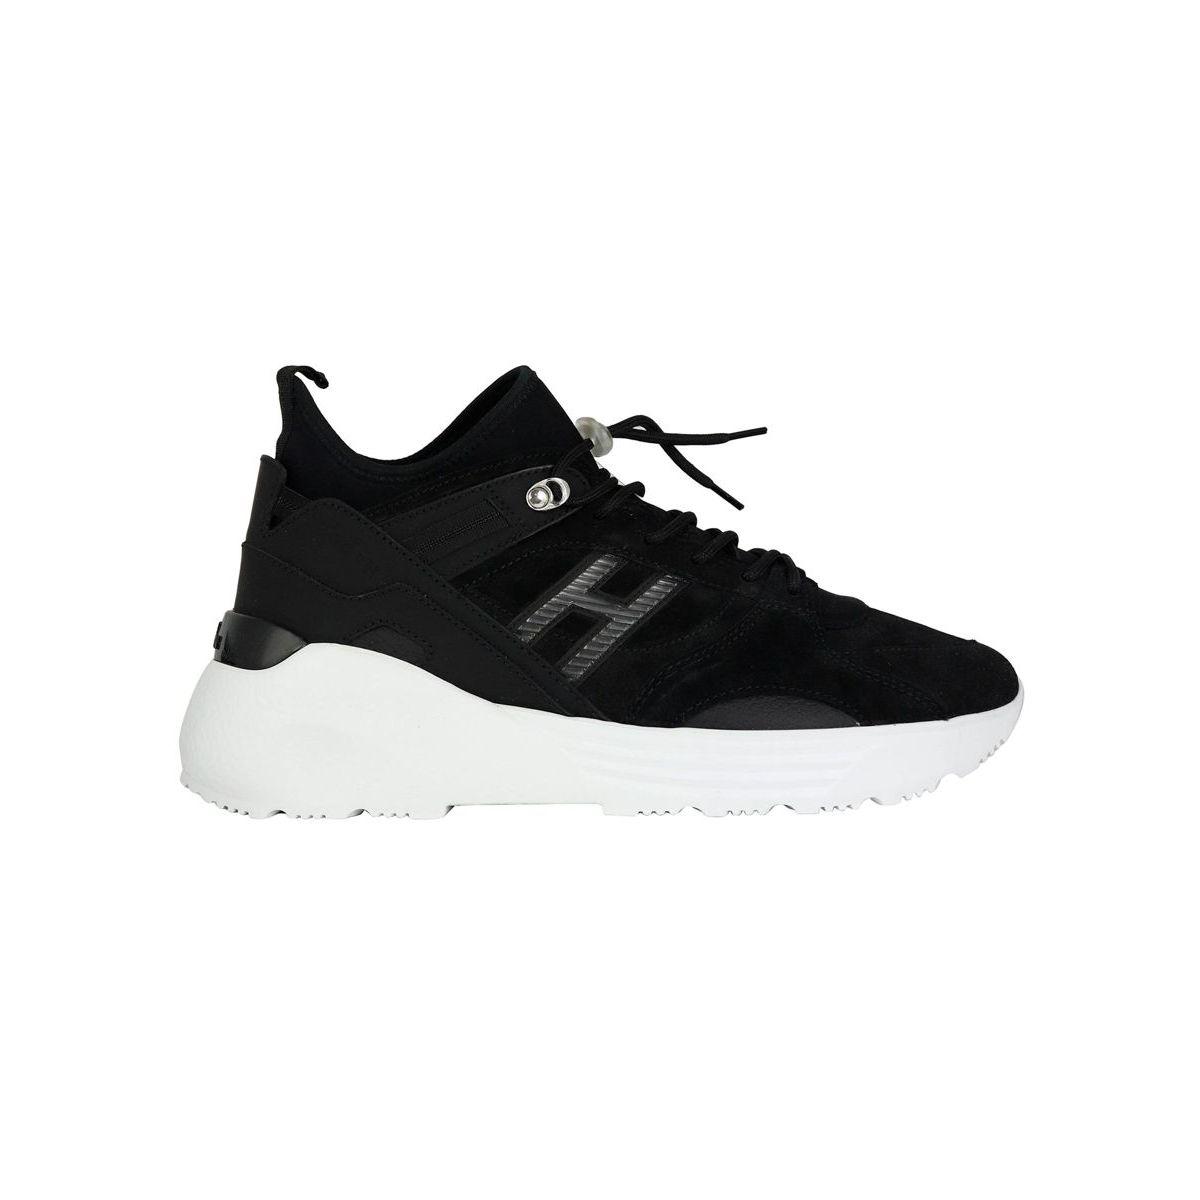 Trekking sneakers in suede bottom 443 Black Hogan